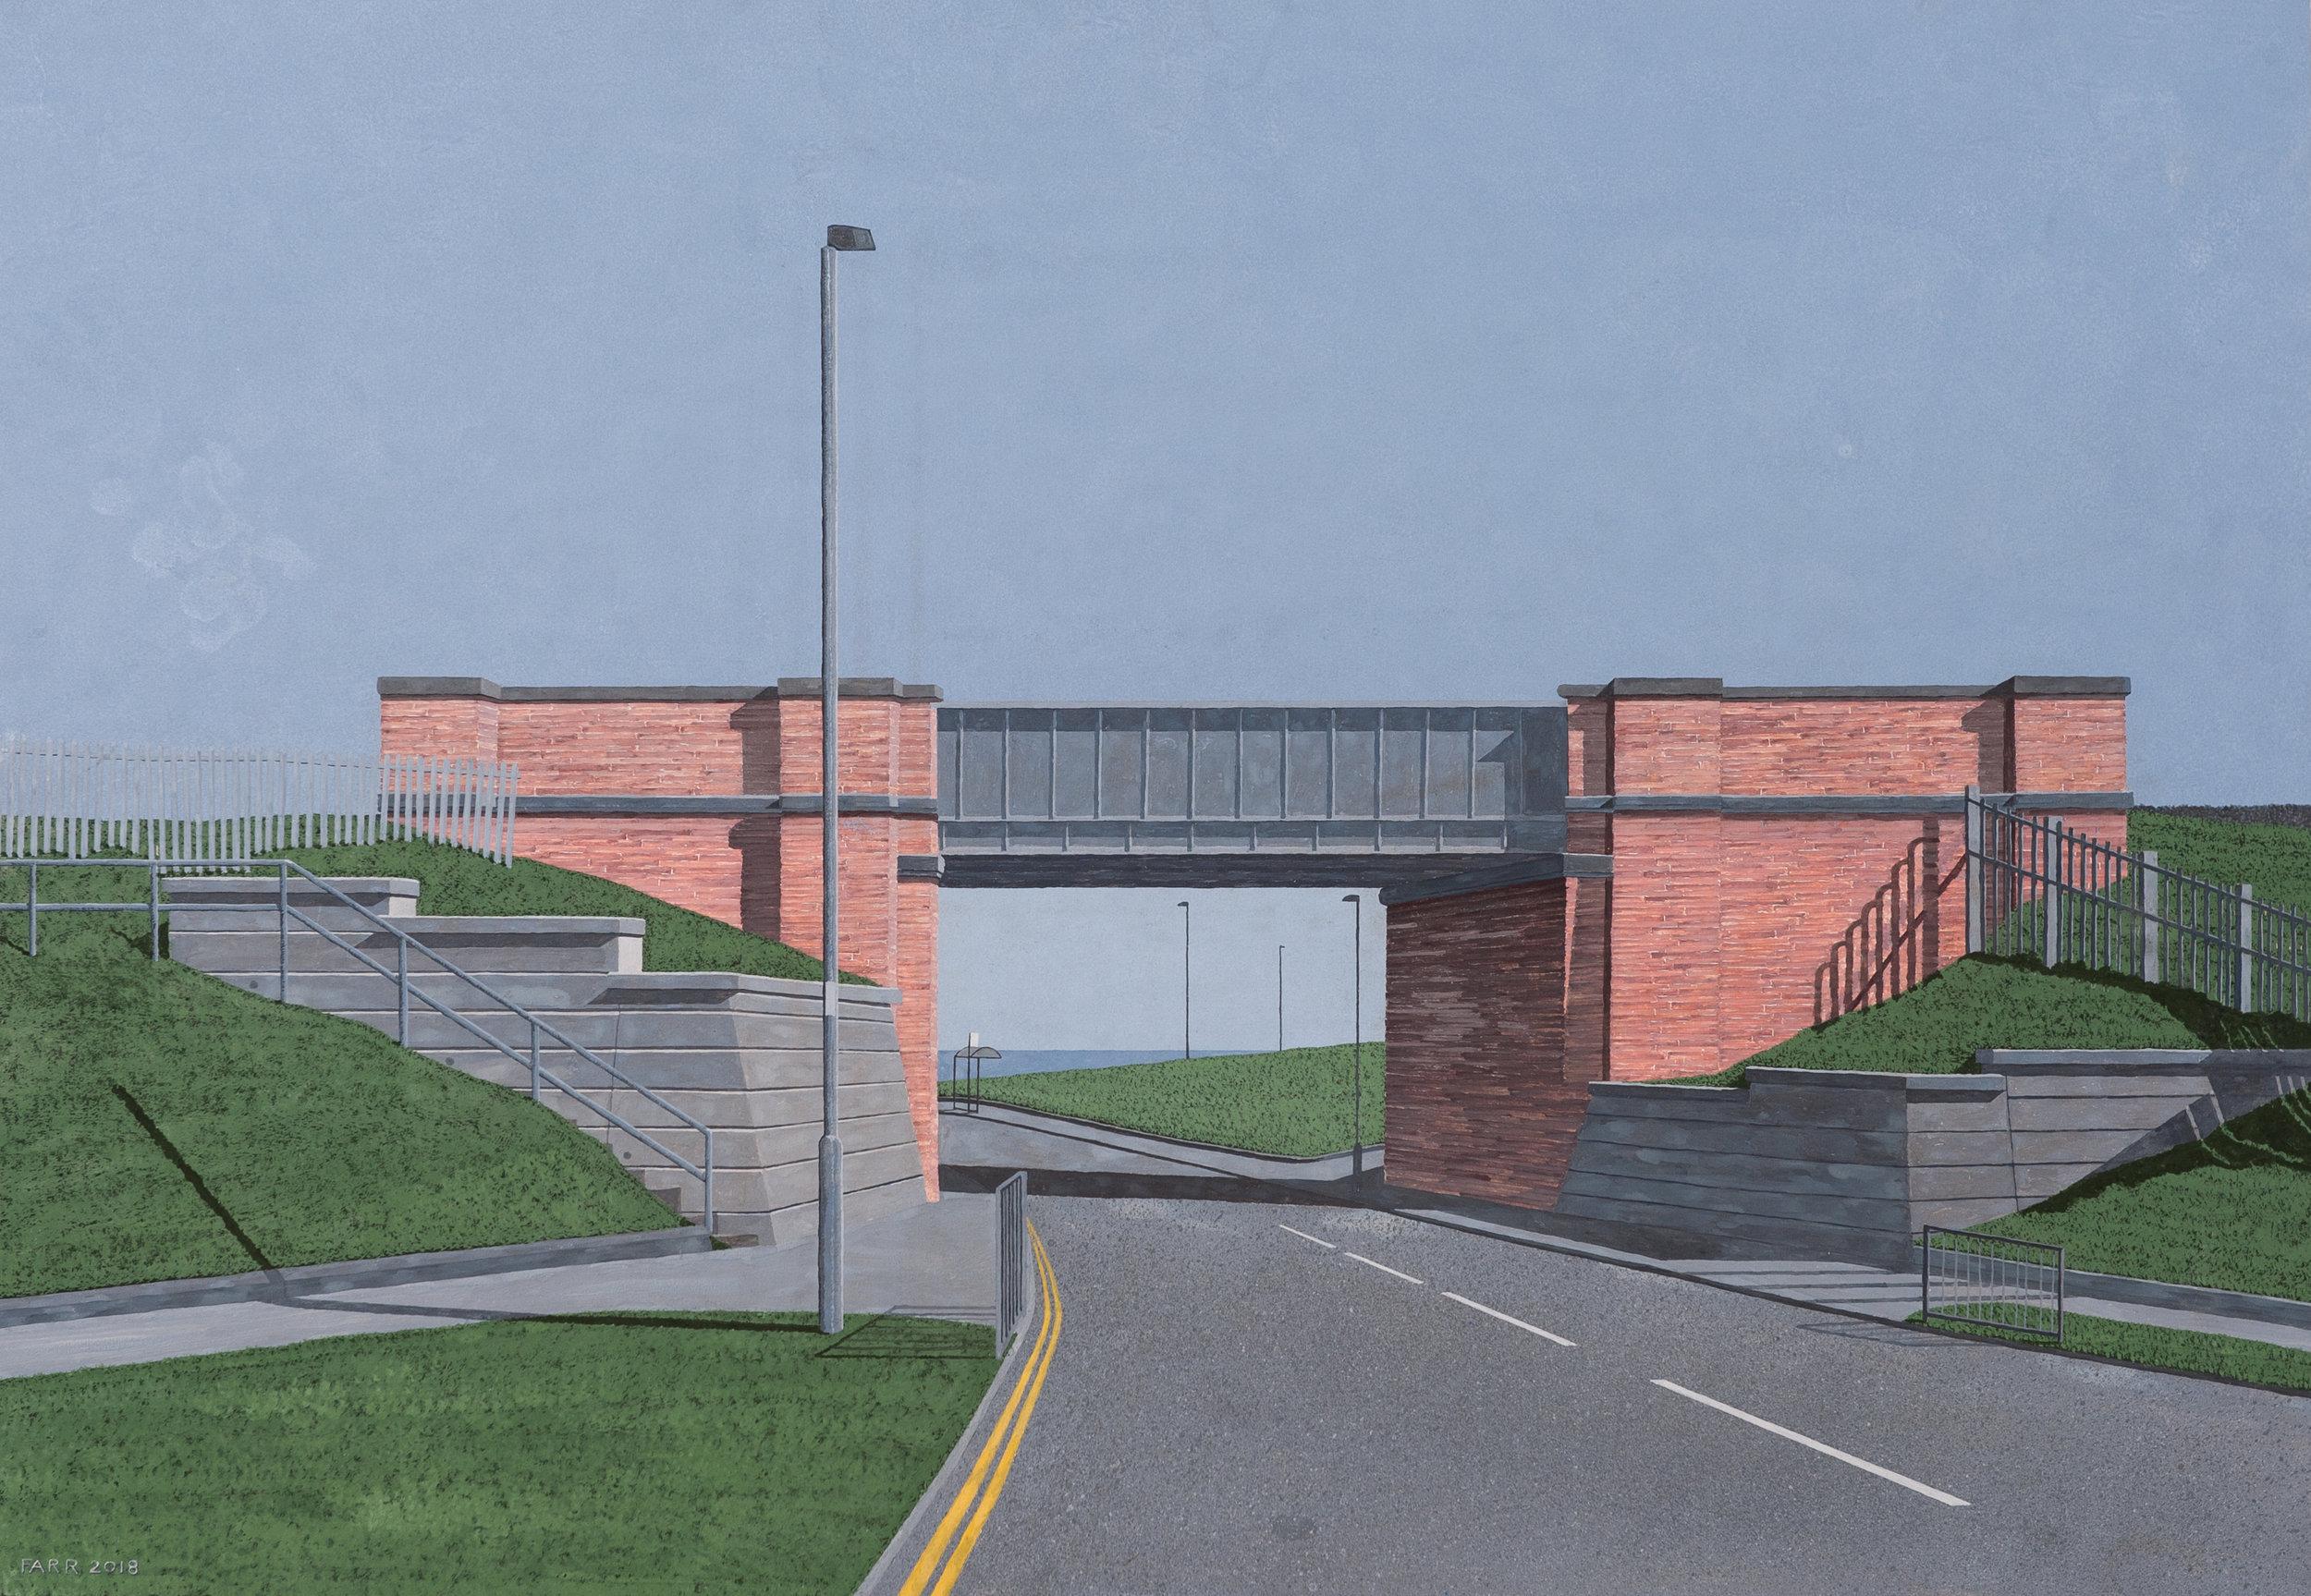 Peter Farr - Metro Bridge - Whitley Bay.jpg